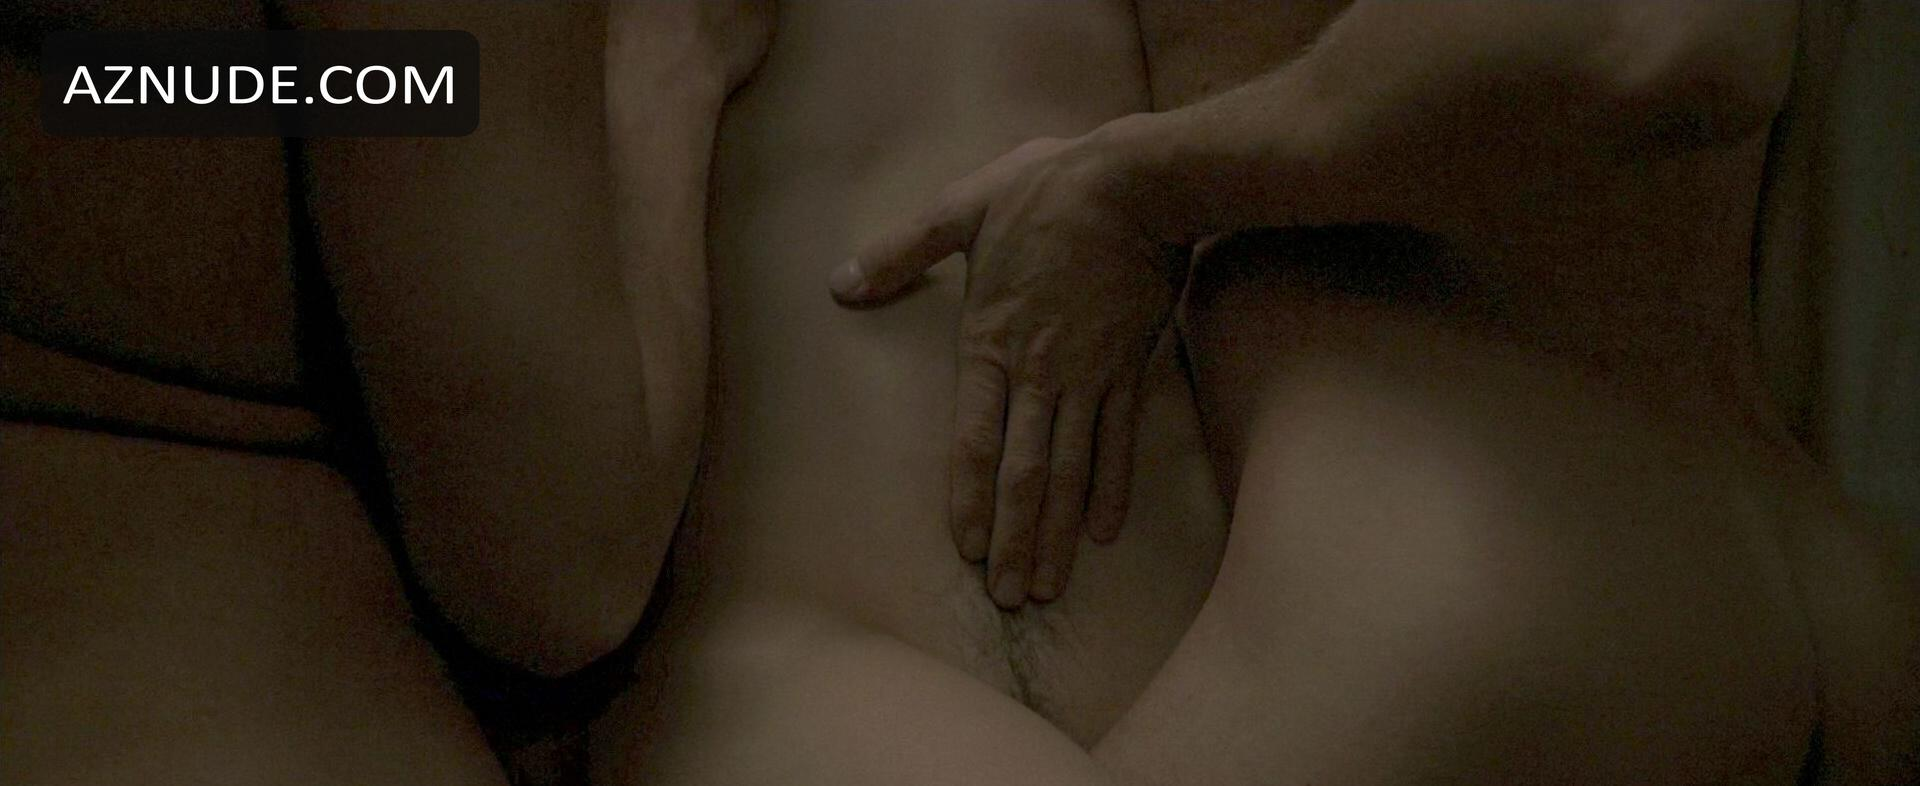 Marine vacth young and beautiful 2013 sex scene - 4 10